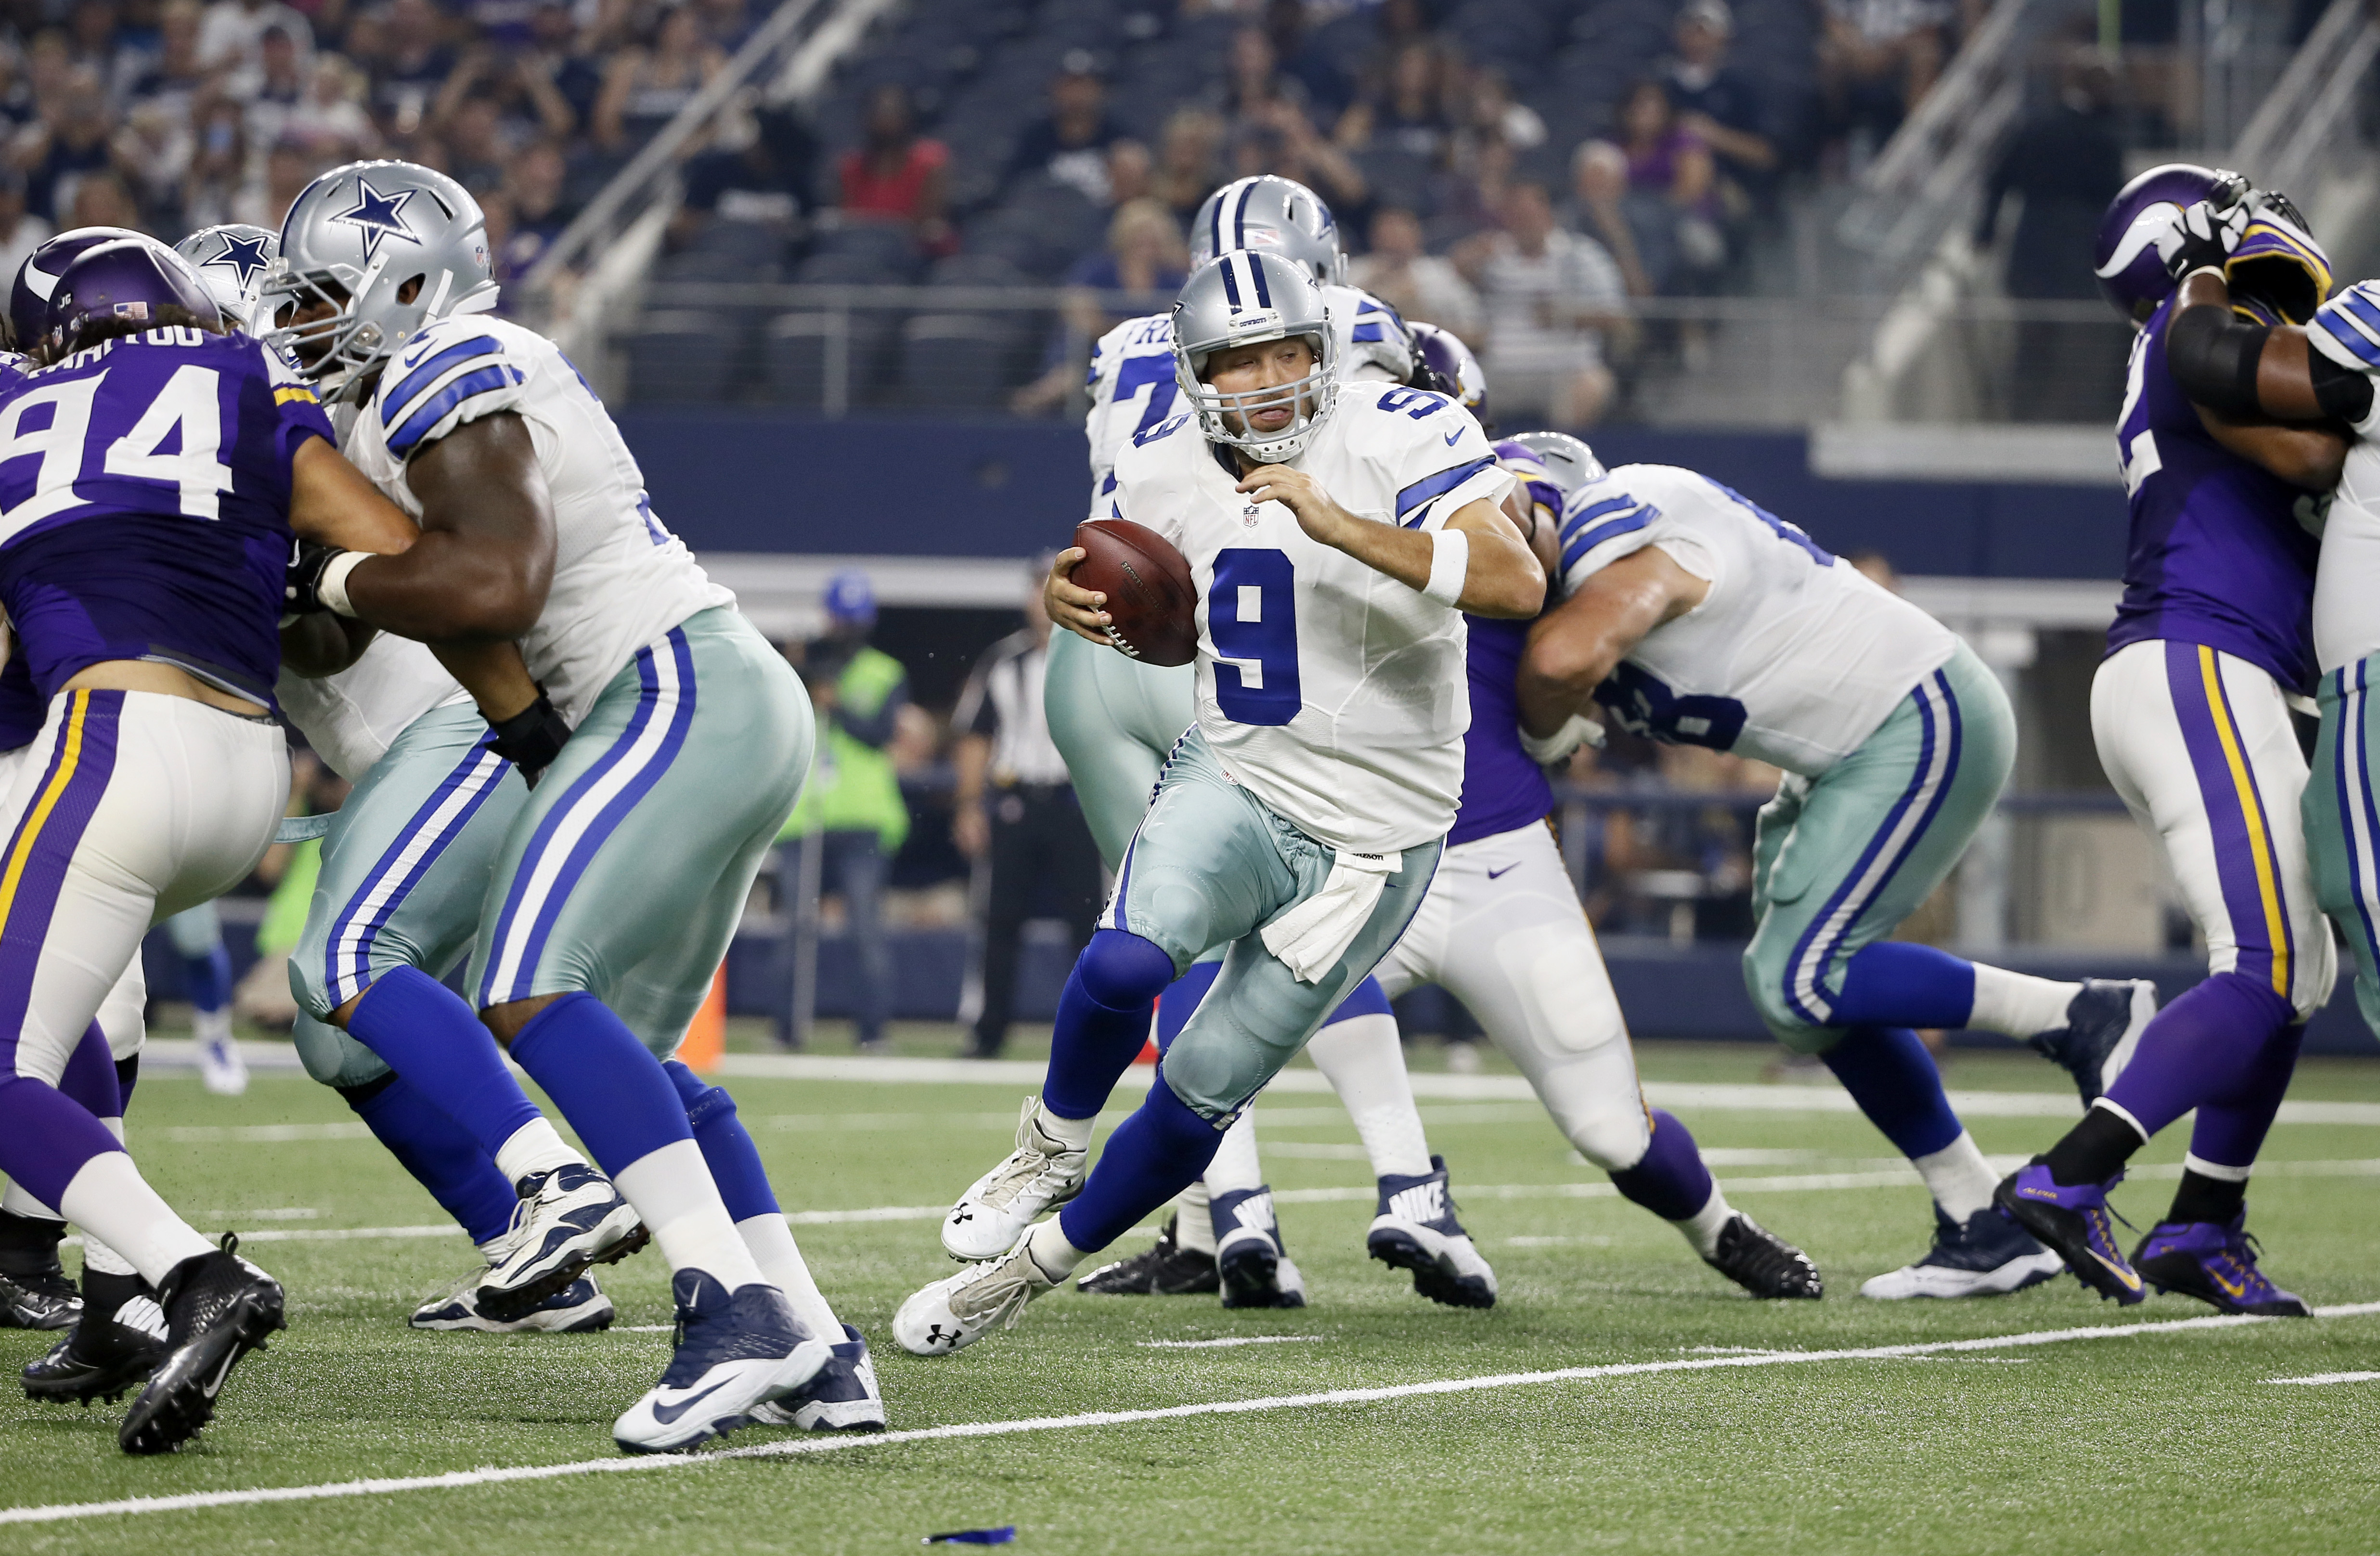 Dallas Cowboys quarterback Tony Romo (9) scrambles in the pocket against the Minnesota Vikings during the first half of a preseason NFL football game Saturday, Aug. 29, 2015, in Arlington, Texas. (AP Photo/Tony Gutierrez)